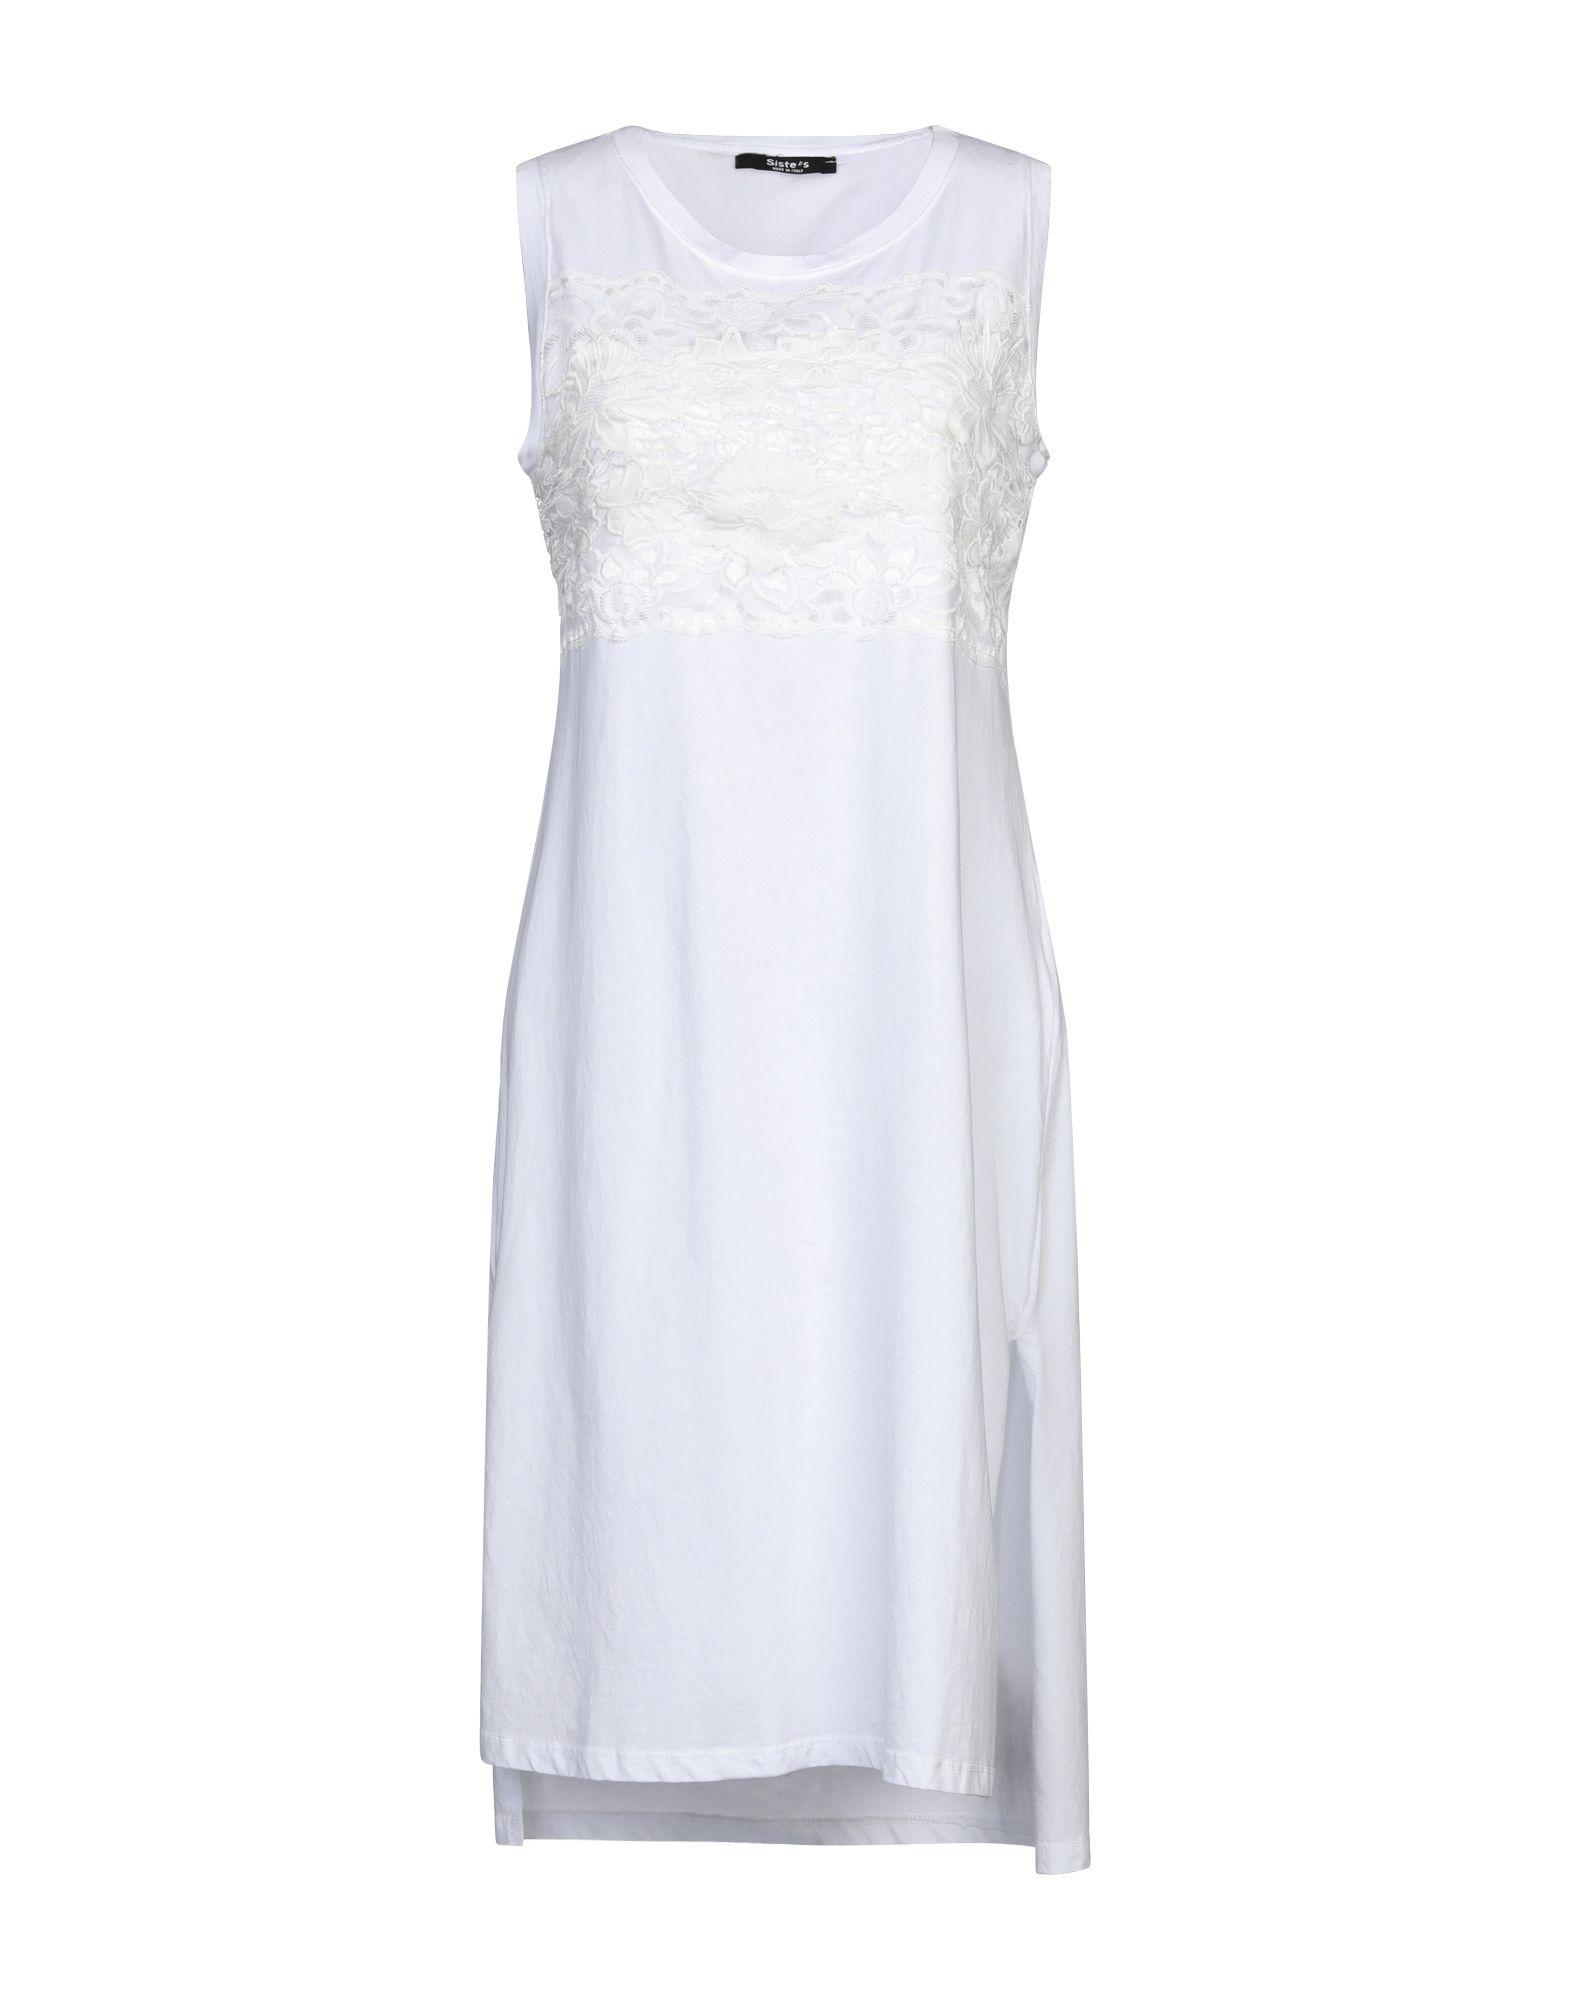 SISTE' S Платье до колена цена и фото